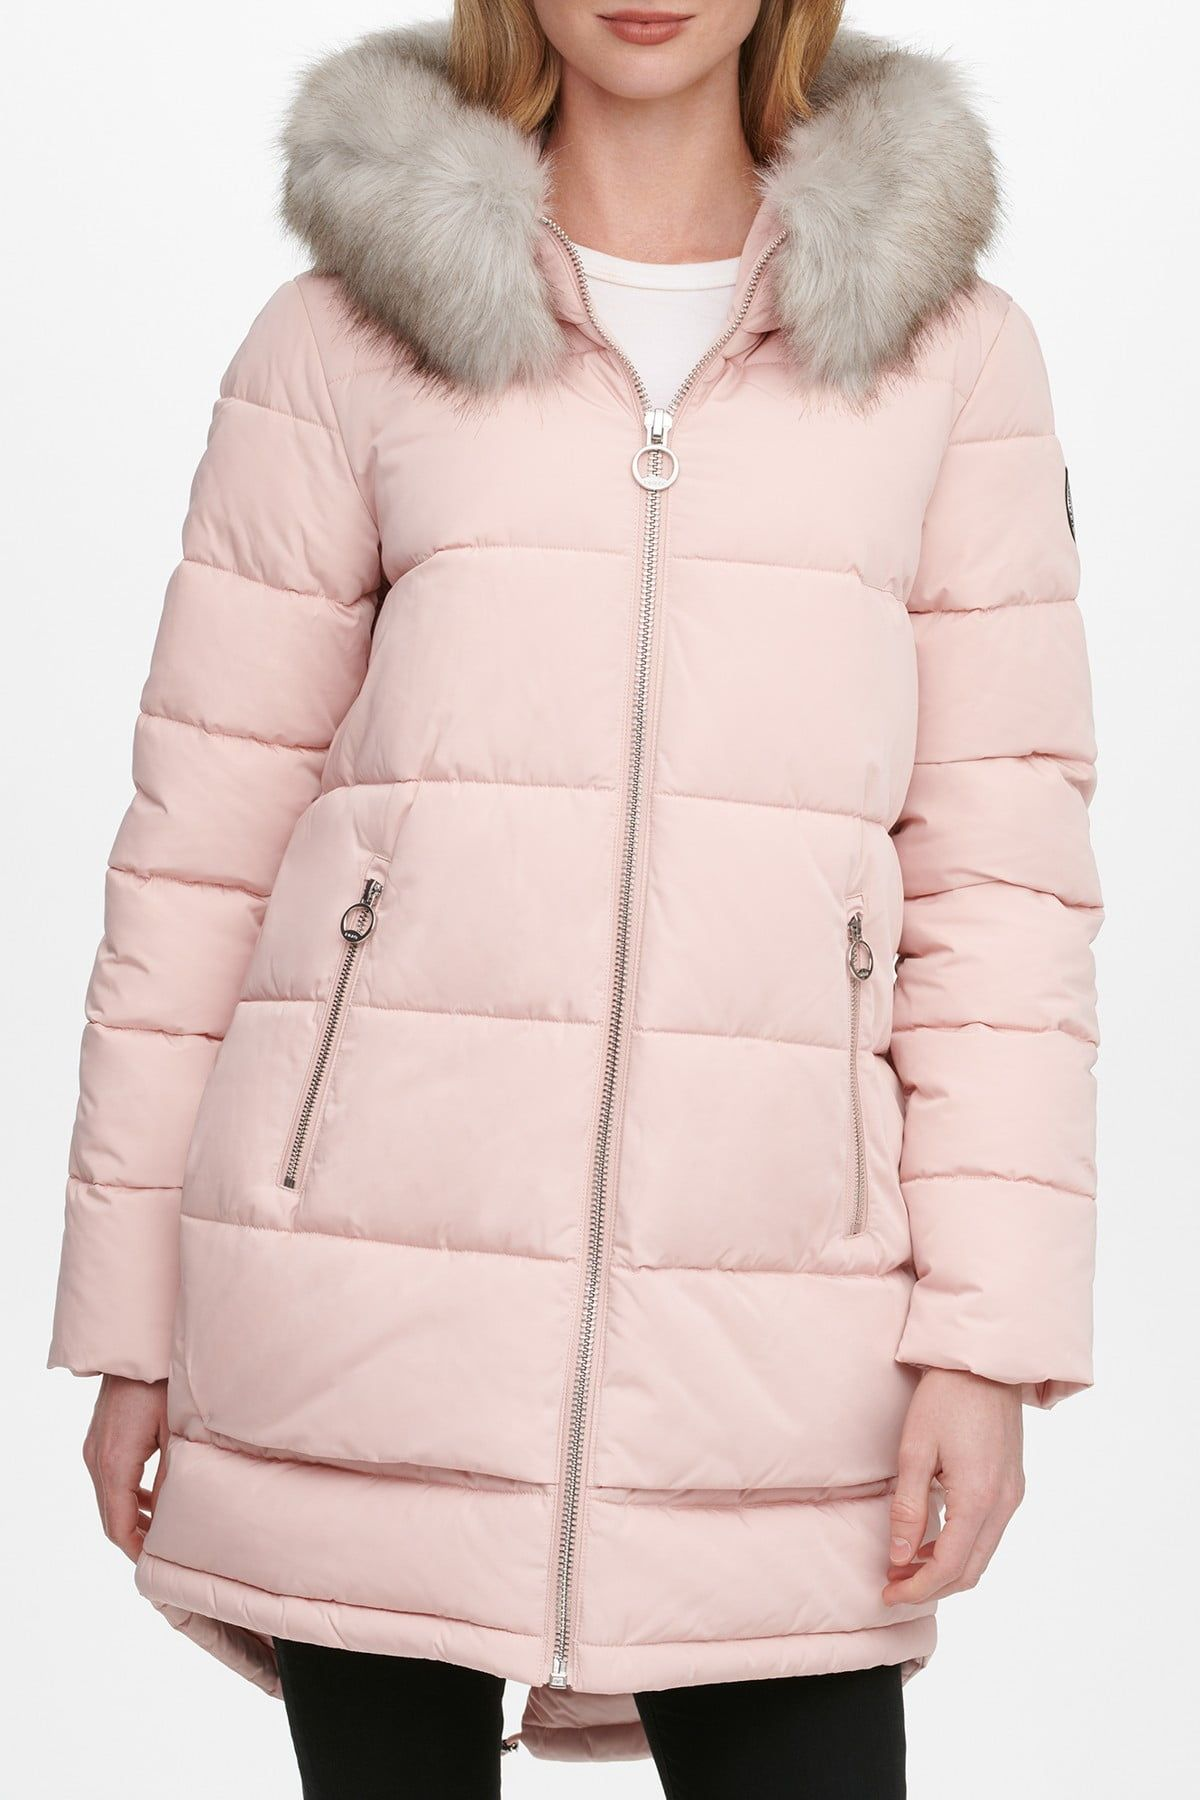 Dkny Zip Front Puffer With Faux Fur Trim Hood Nordstrom Rack Coats For Women Puffer Coat Fur Trim [ 1800 x 1200 Pixel ]